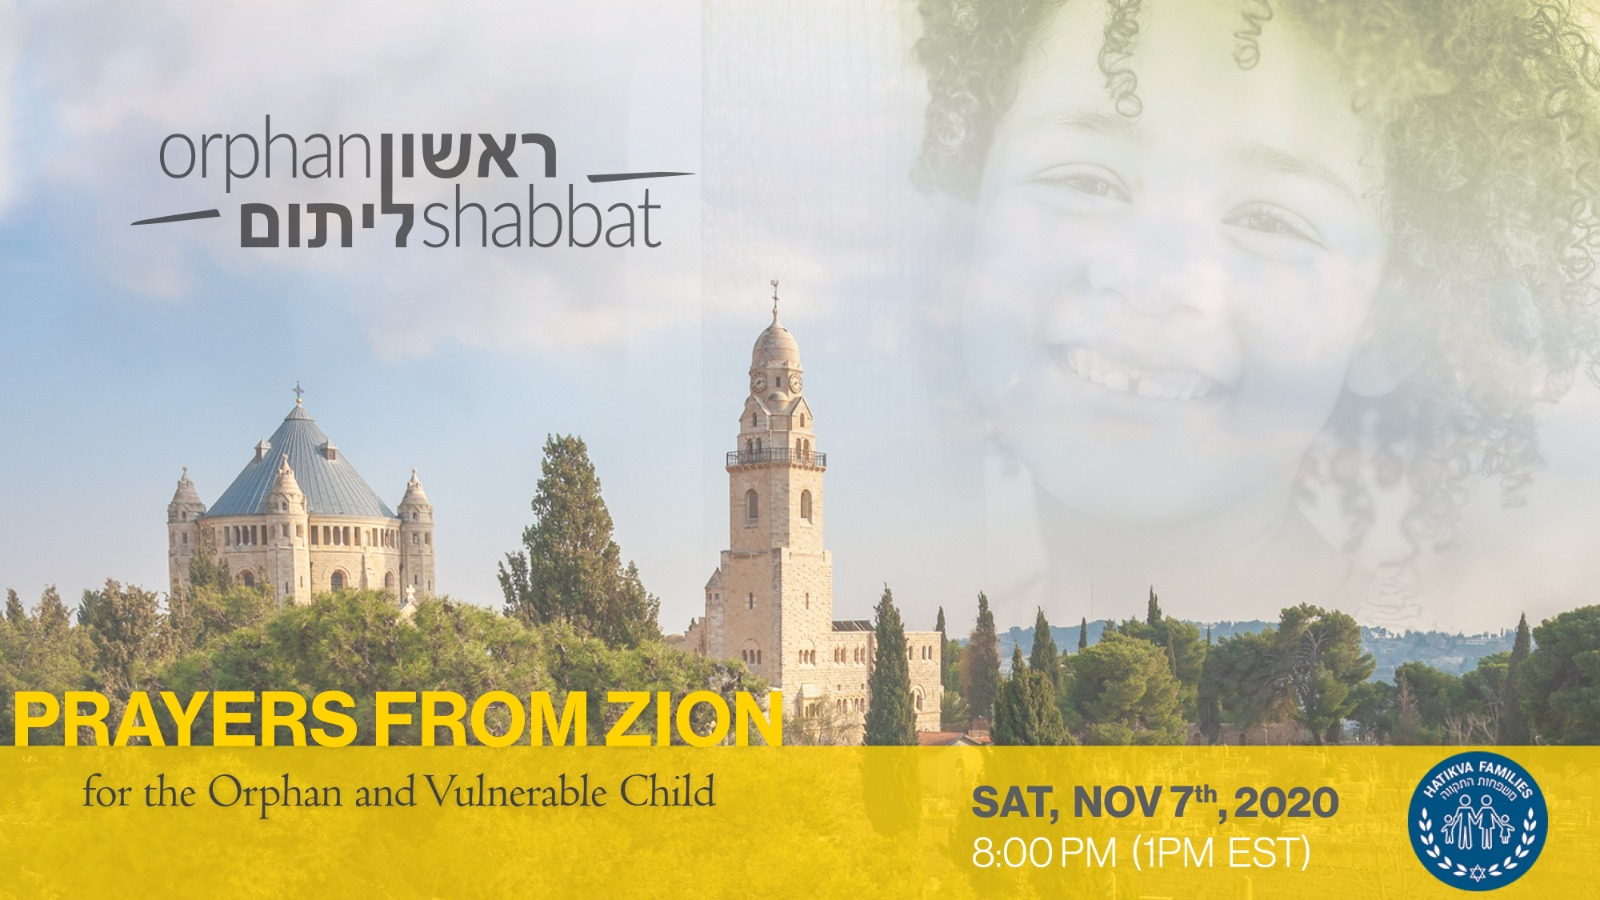 Prayer from Zion